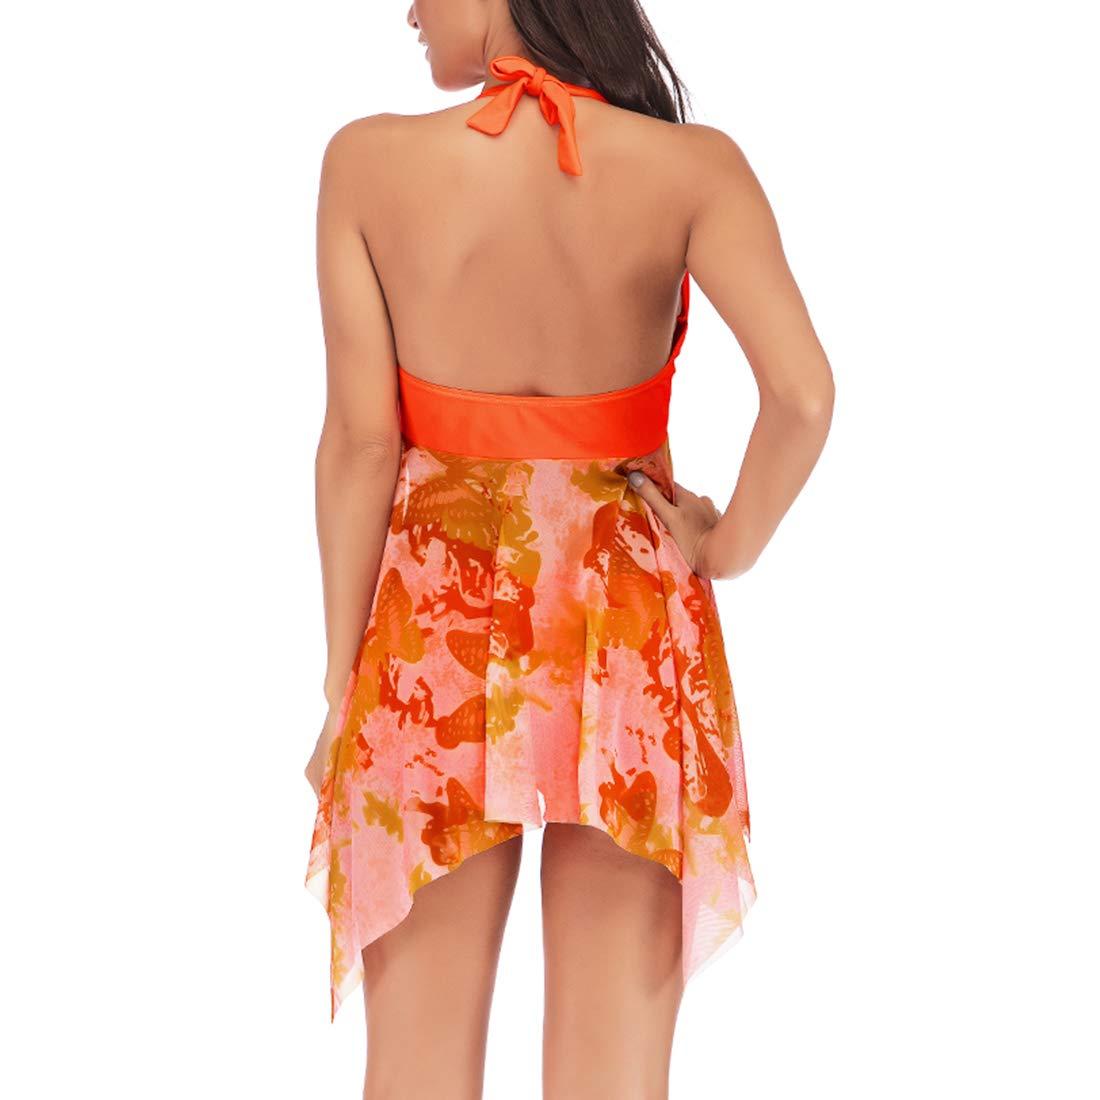 Belgius Women Halter V-Neck Tankini Set Floral Print Mesh Swimdress with Bottom